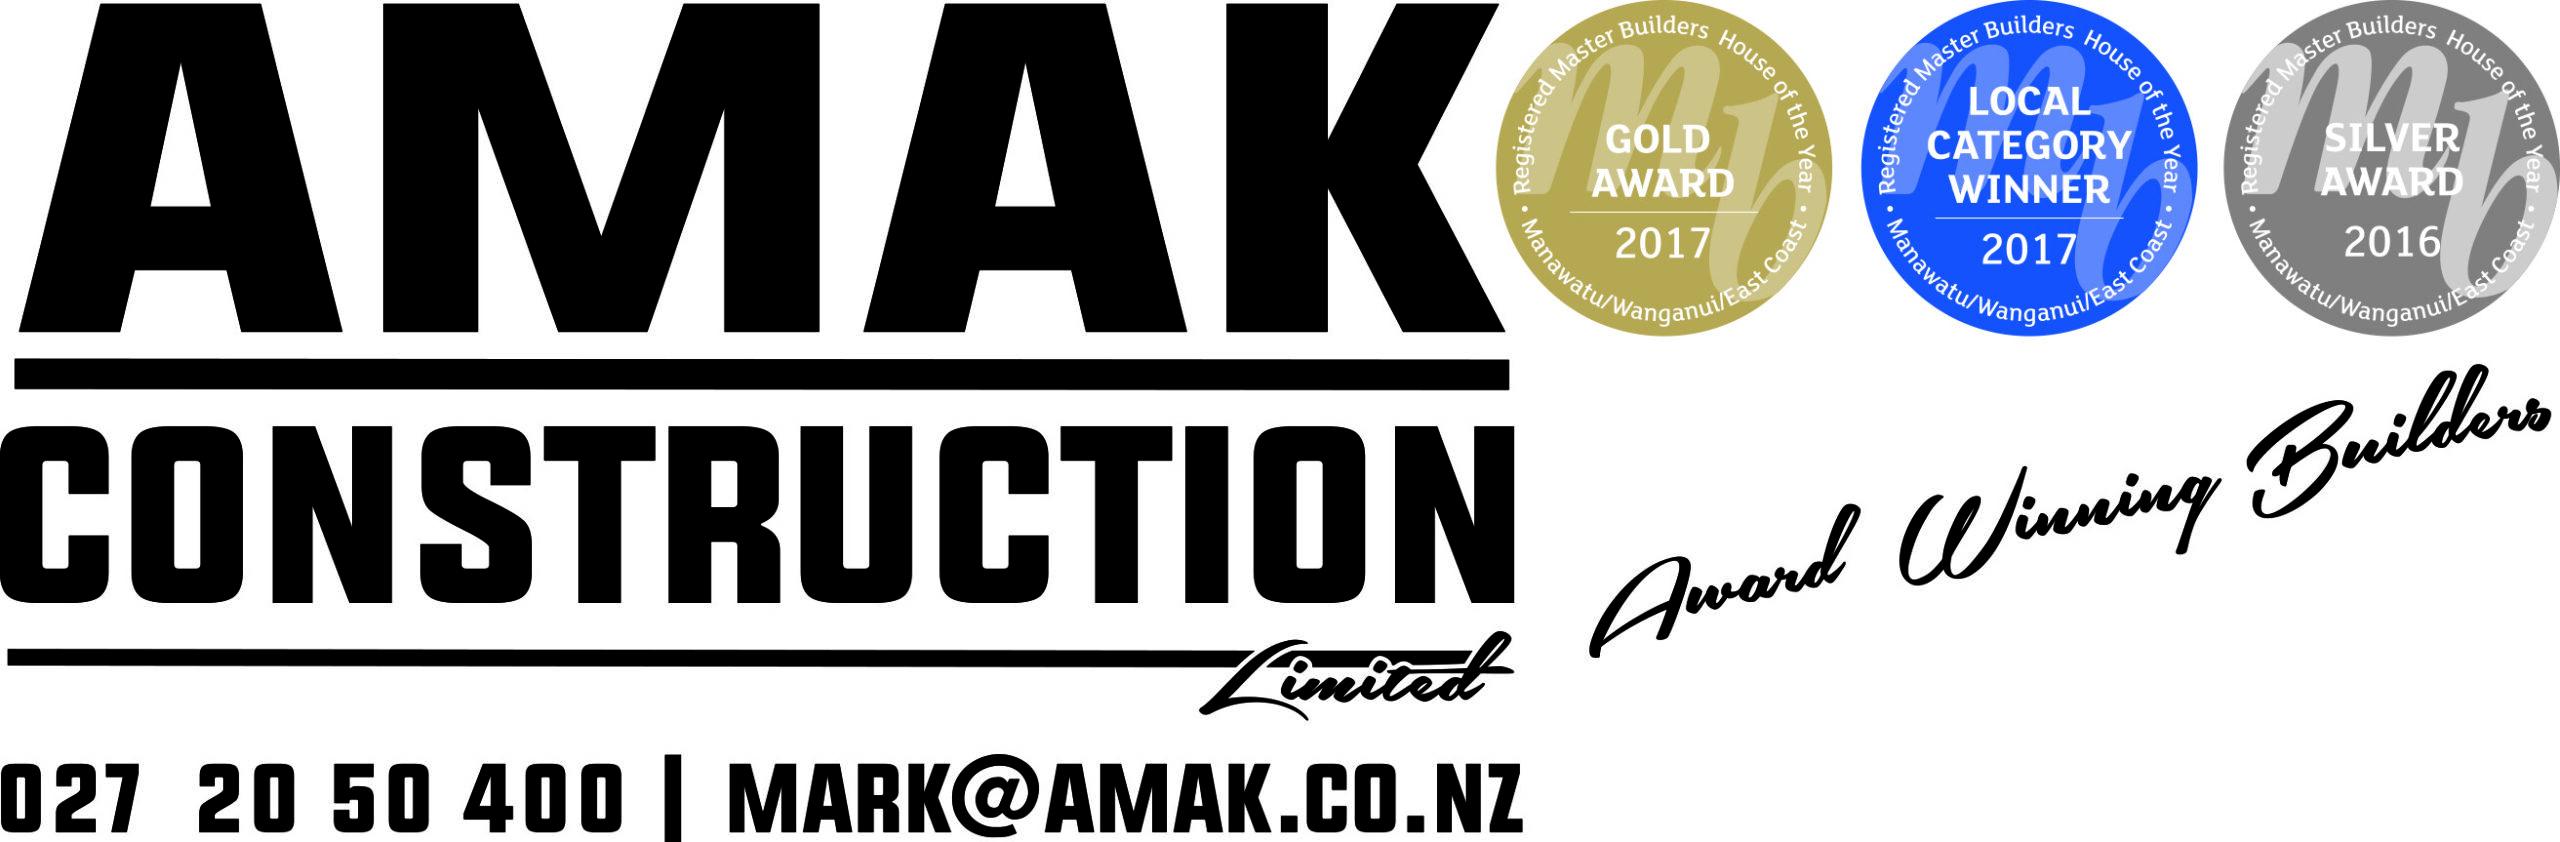 AMAX Advertising GSB